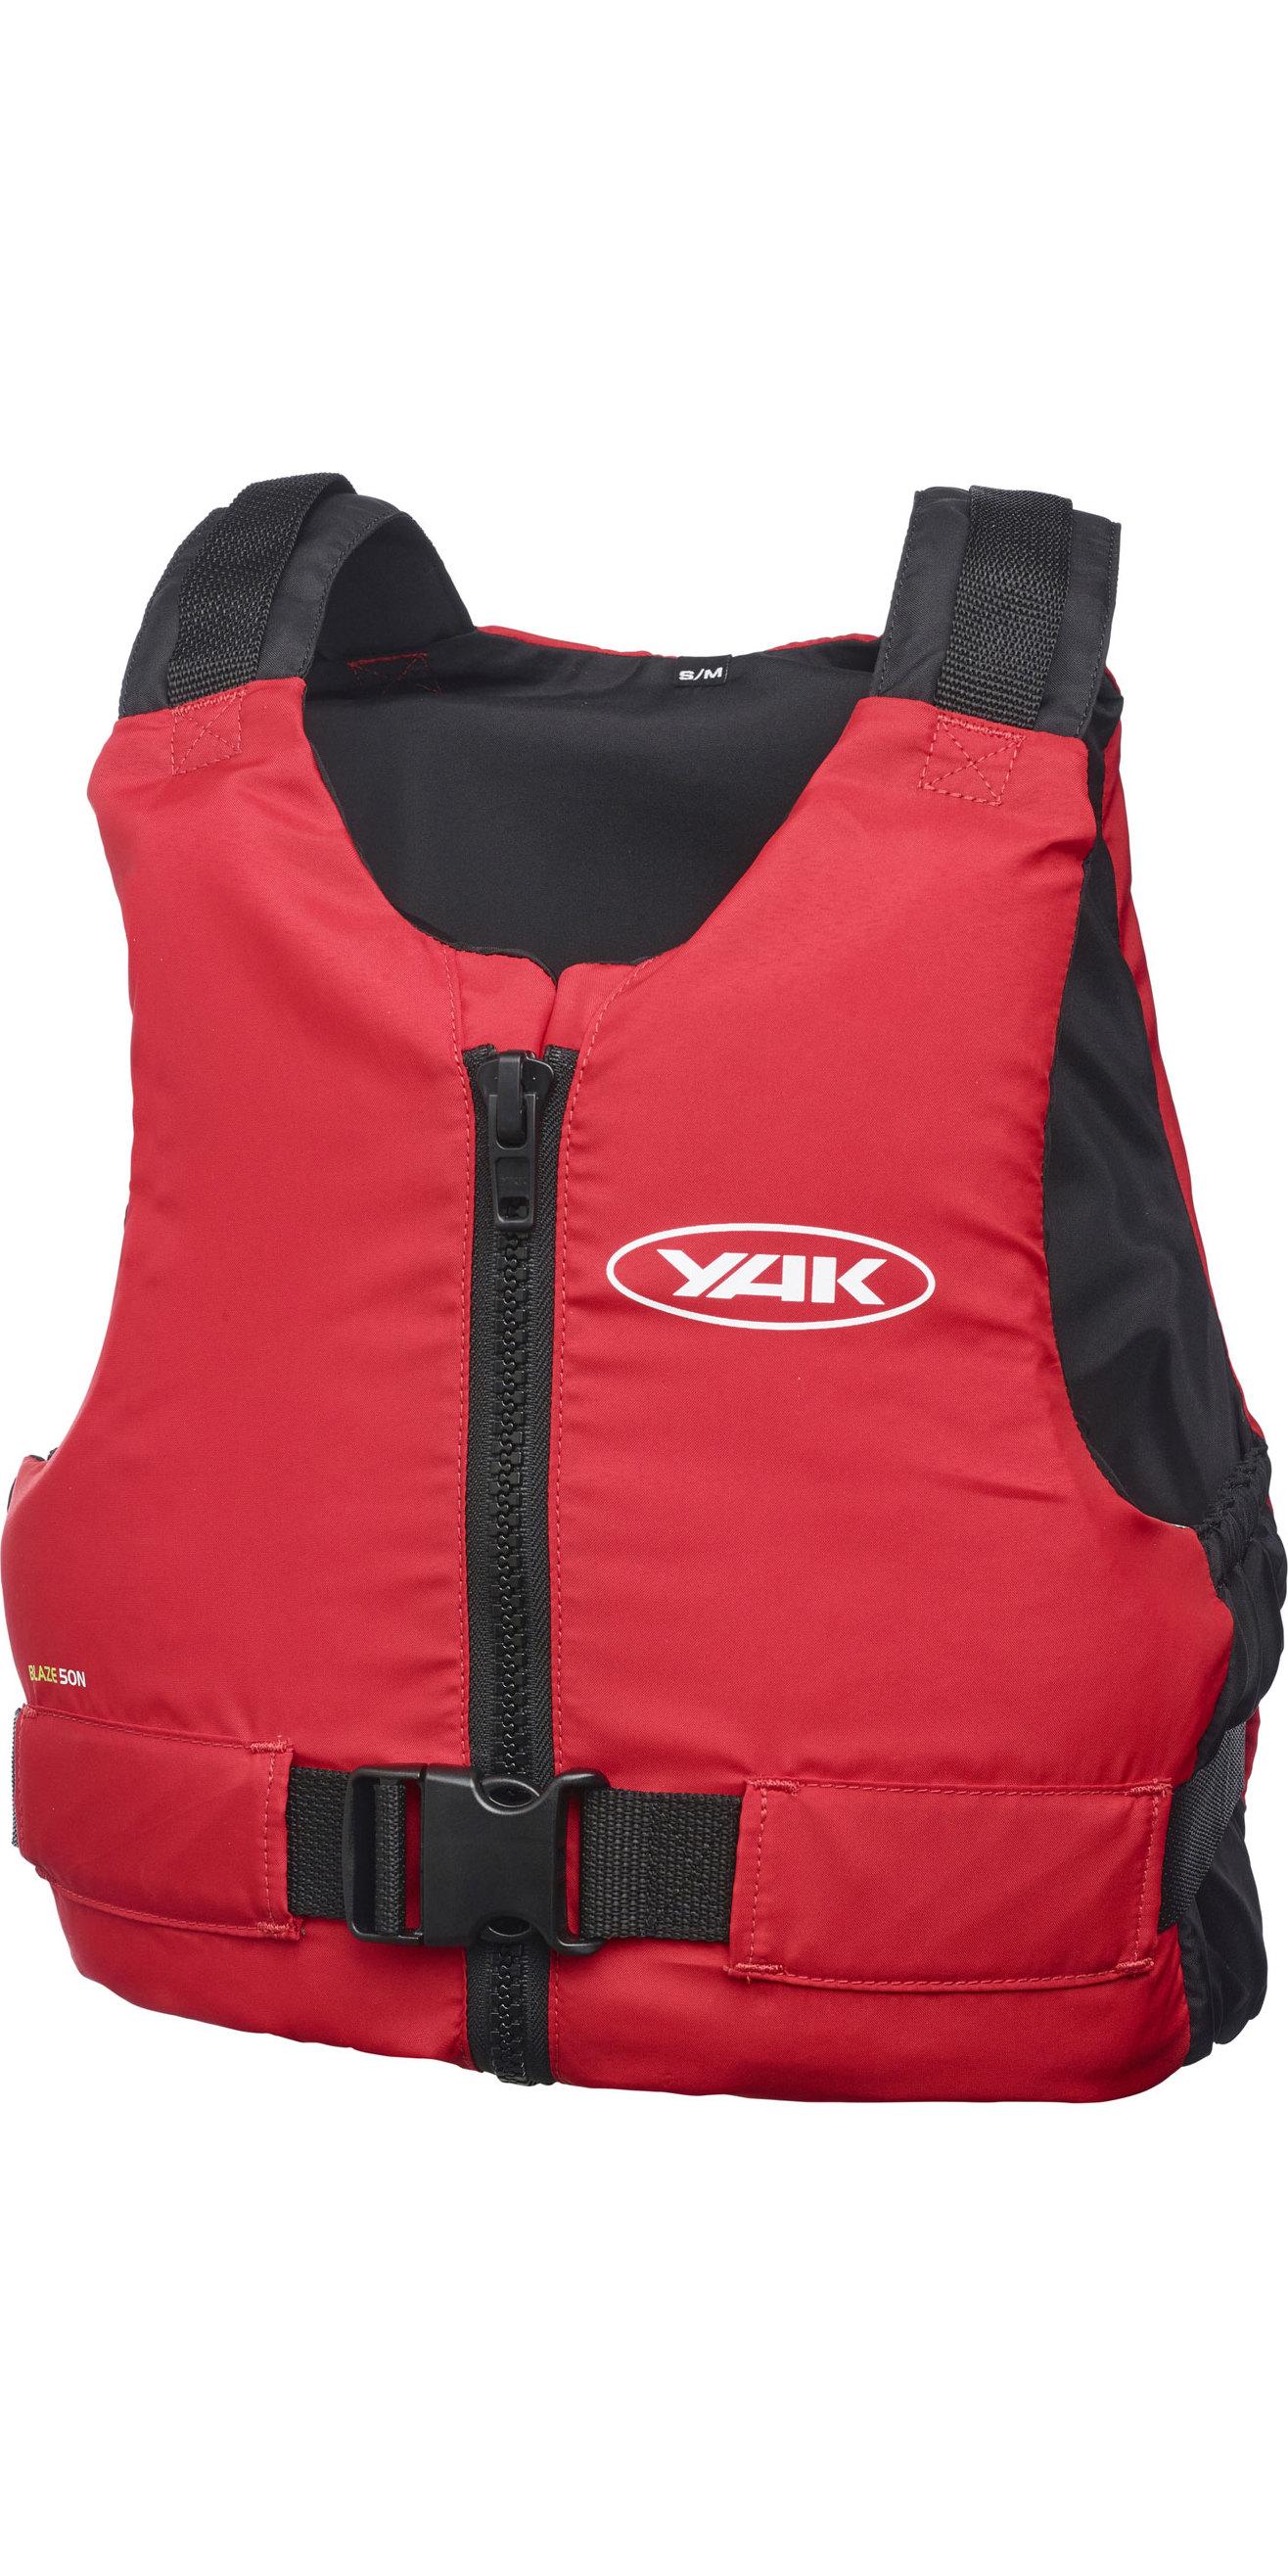 1cda0f281 2019 Yak Blaze Kayak 50N Buoyancy Aid Red 3712